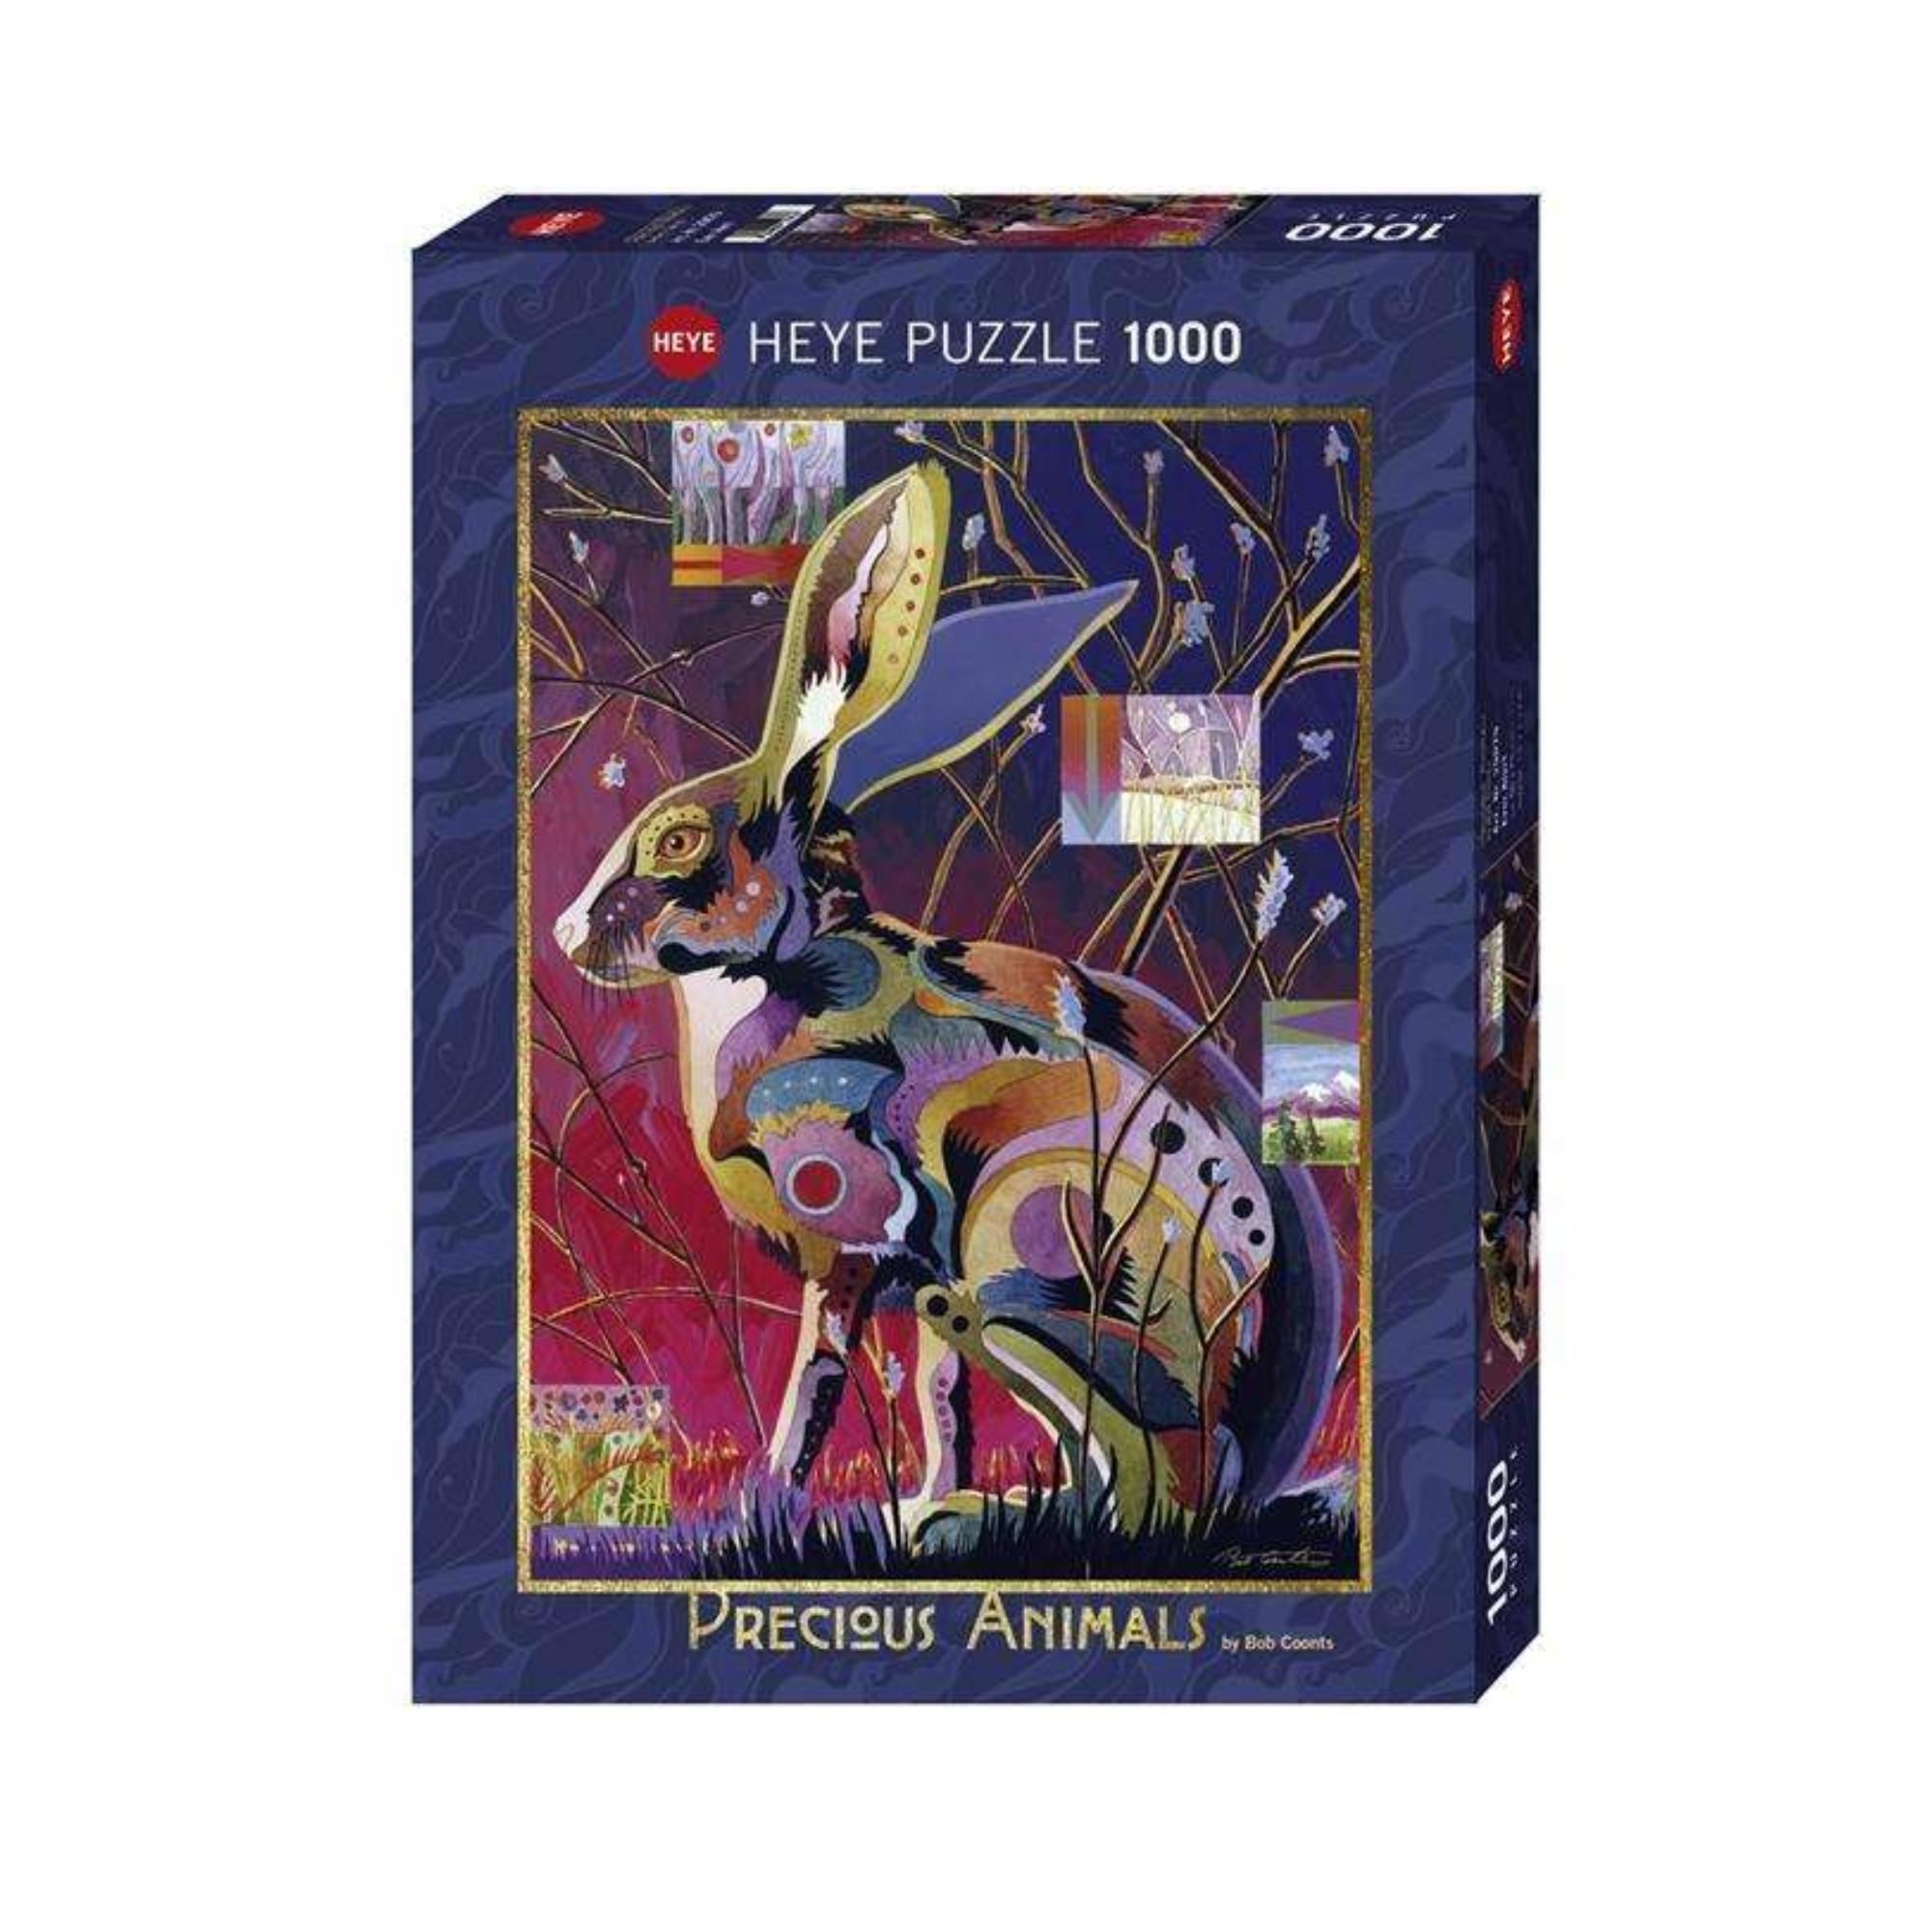 Heye Puzzle 1000: Ever Alert